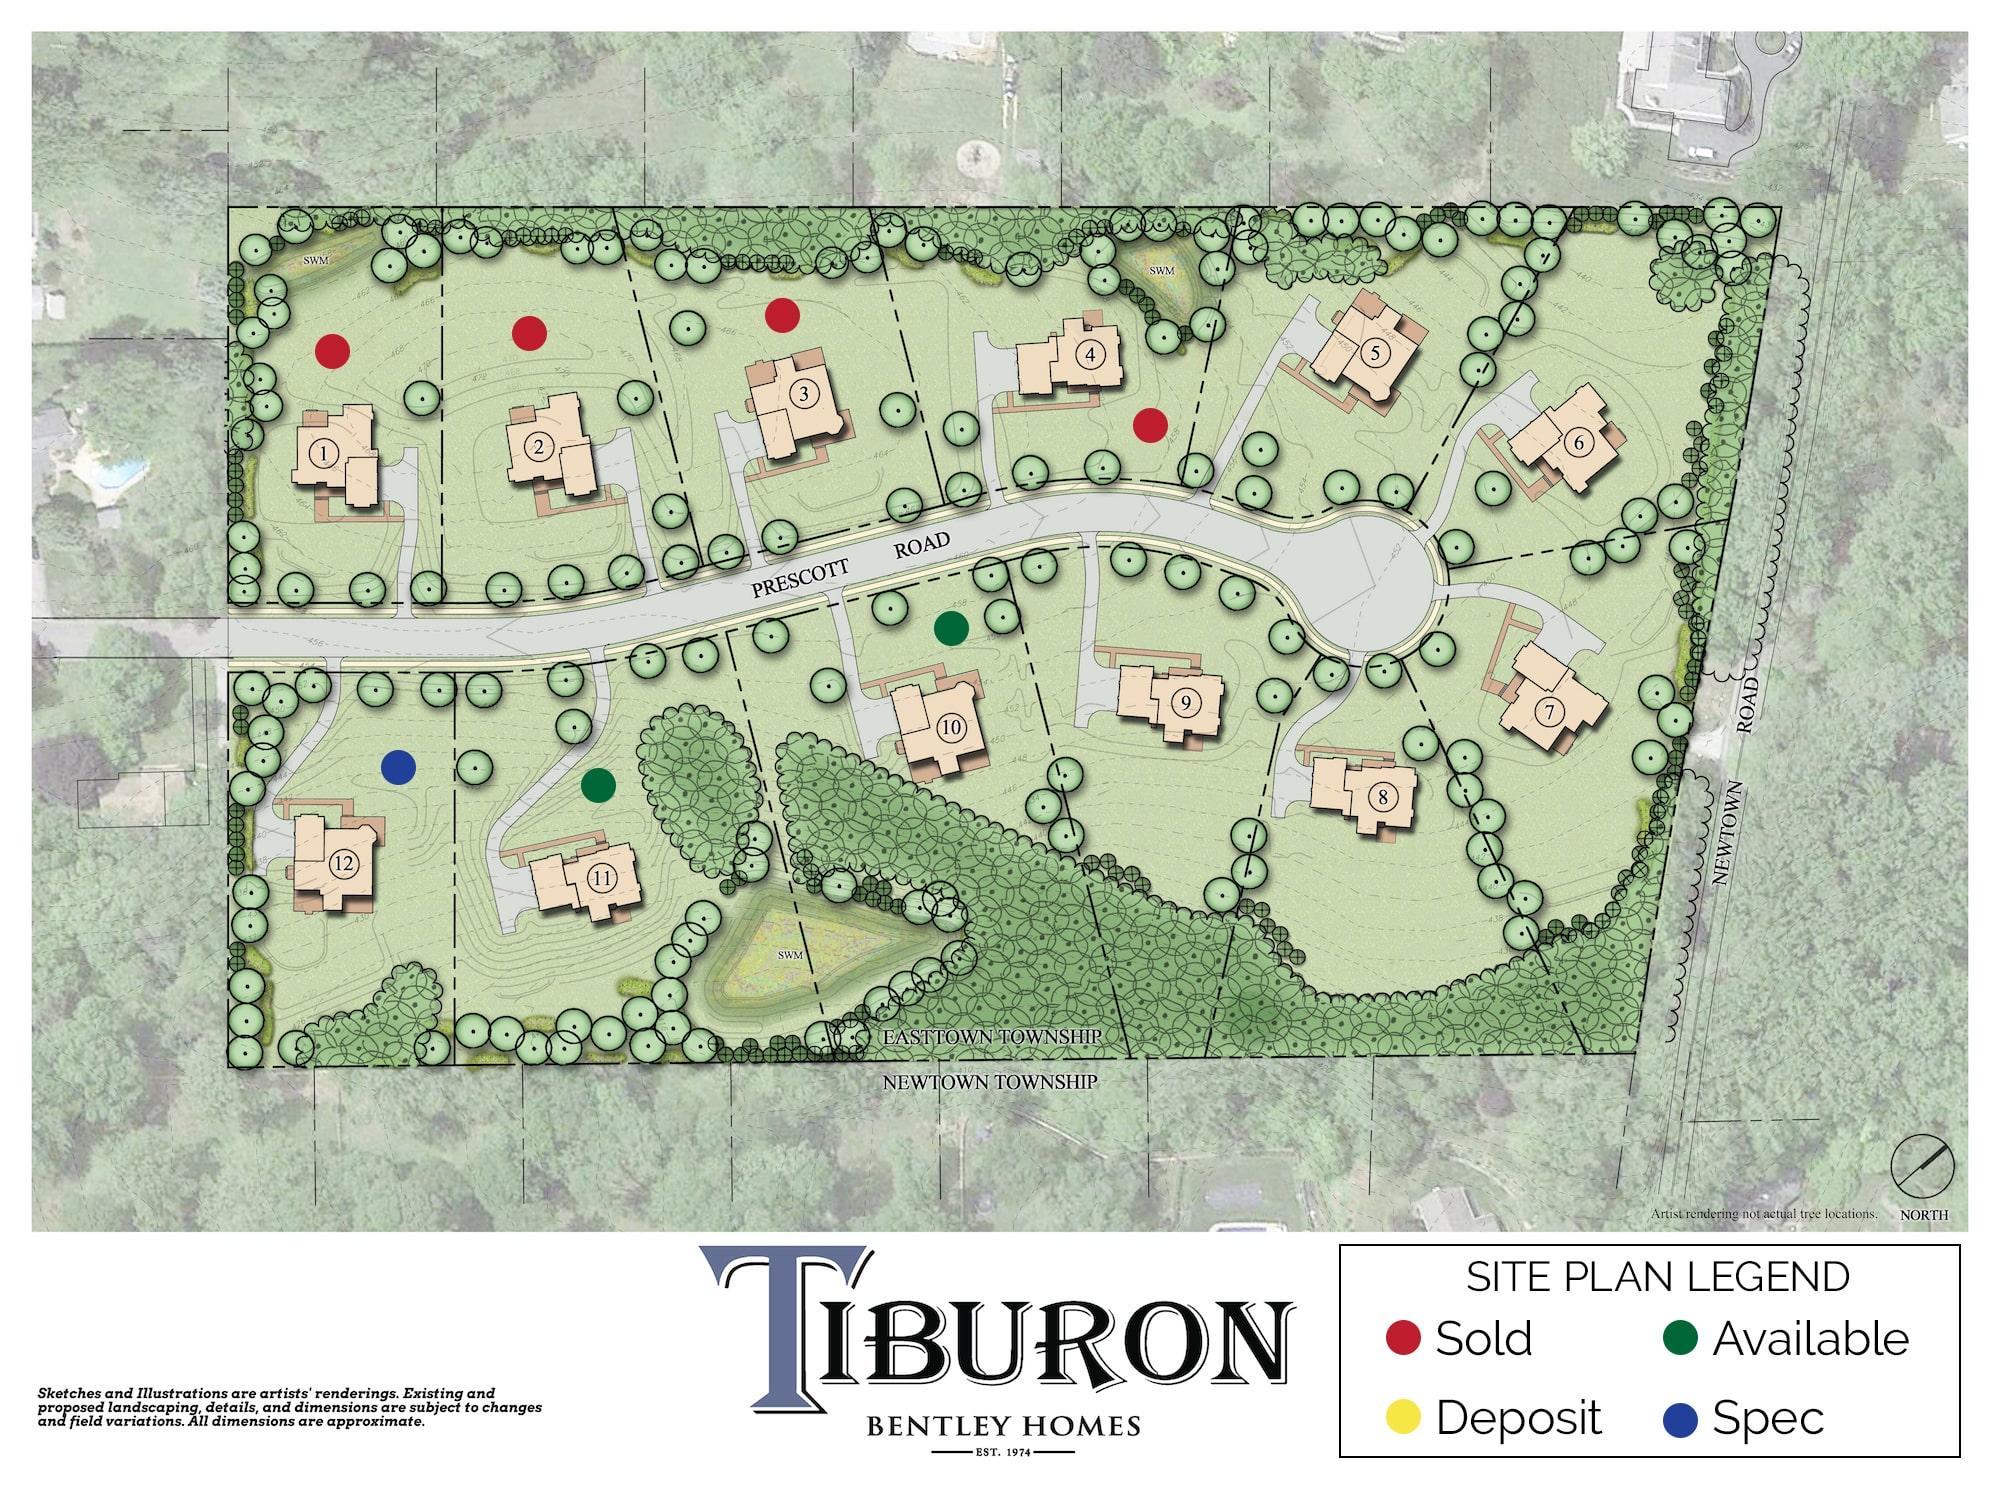 Tiburon New Construction Site Plan in Berwyn